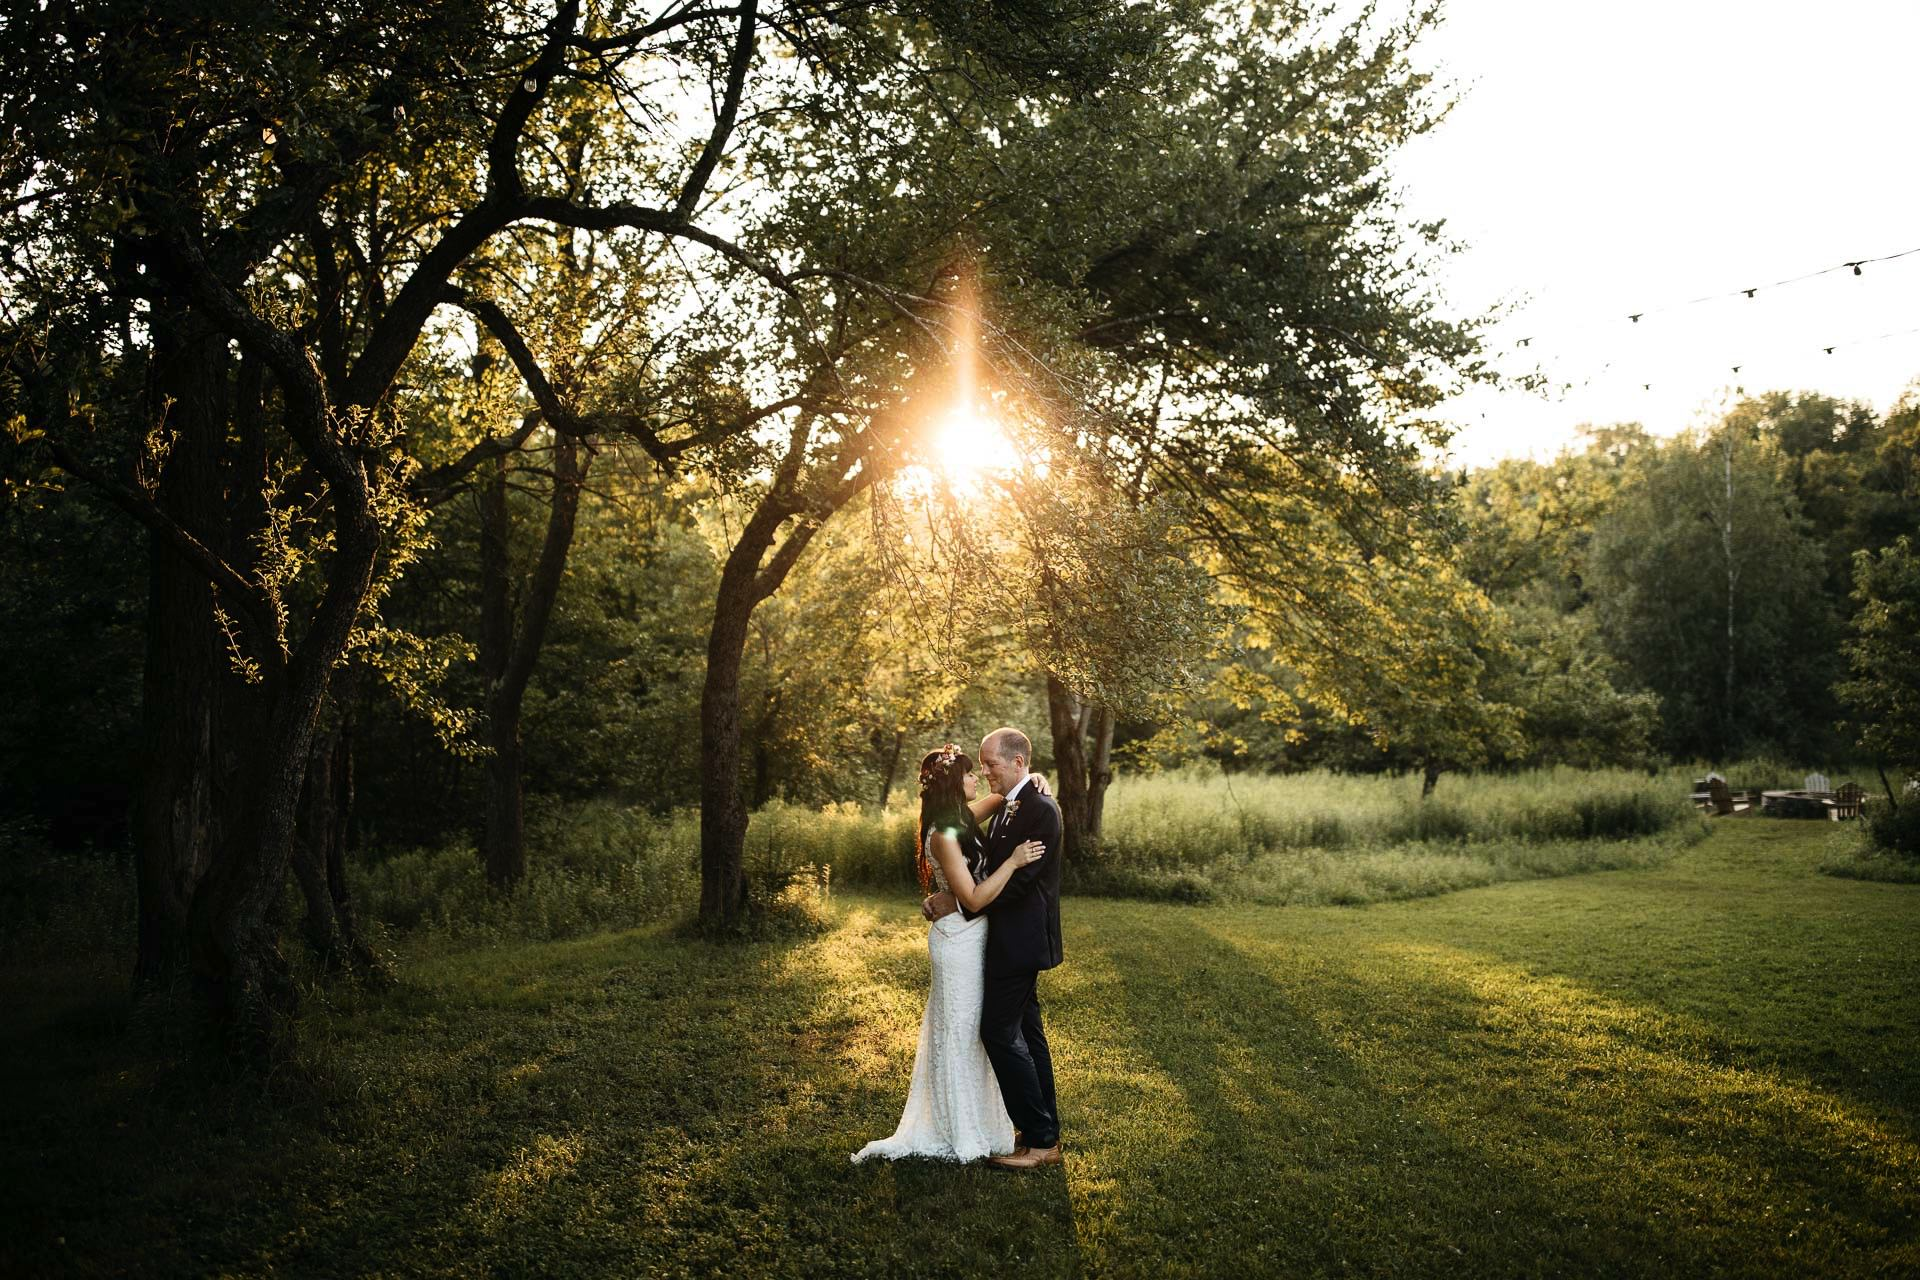 wedding-victoria_mark_handsome_hollow_jeanlaurentgaudy_102.jpg